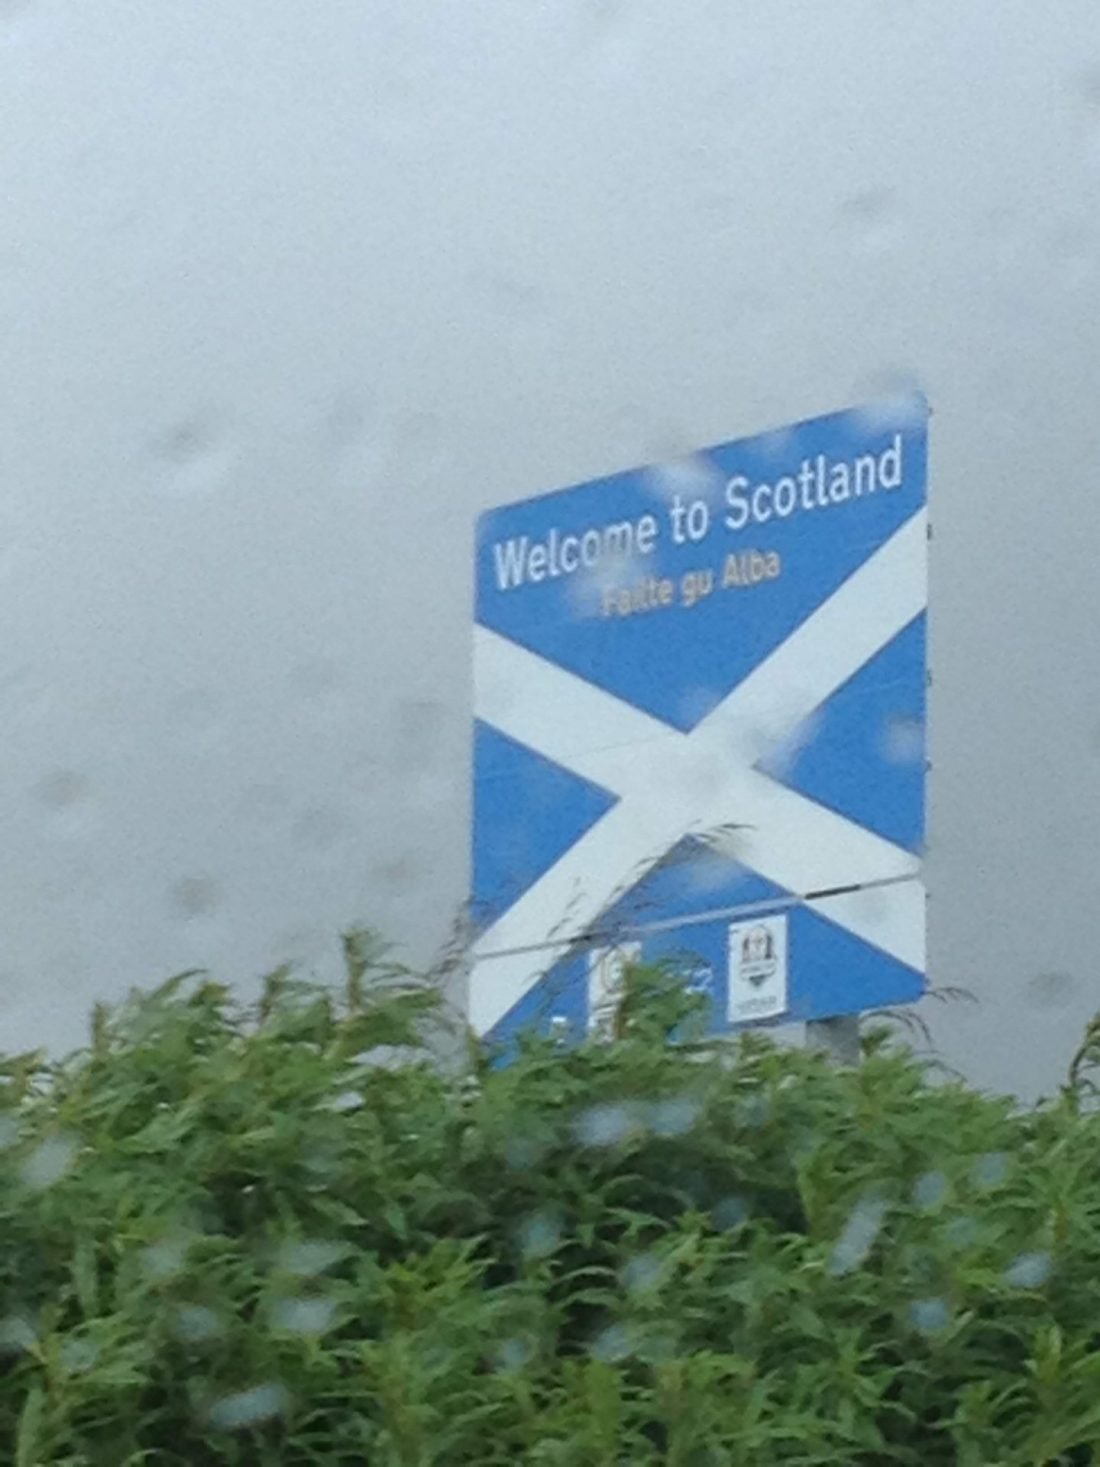 Rain in Edinburgh, Scotland